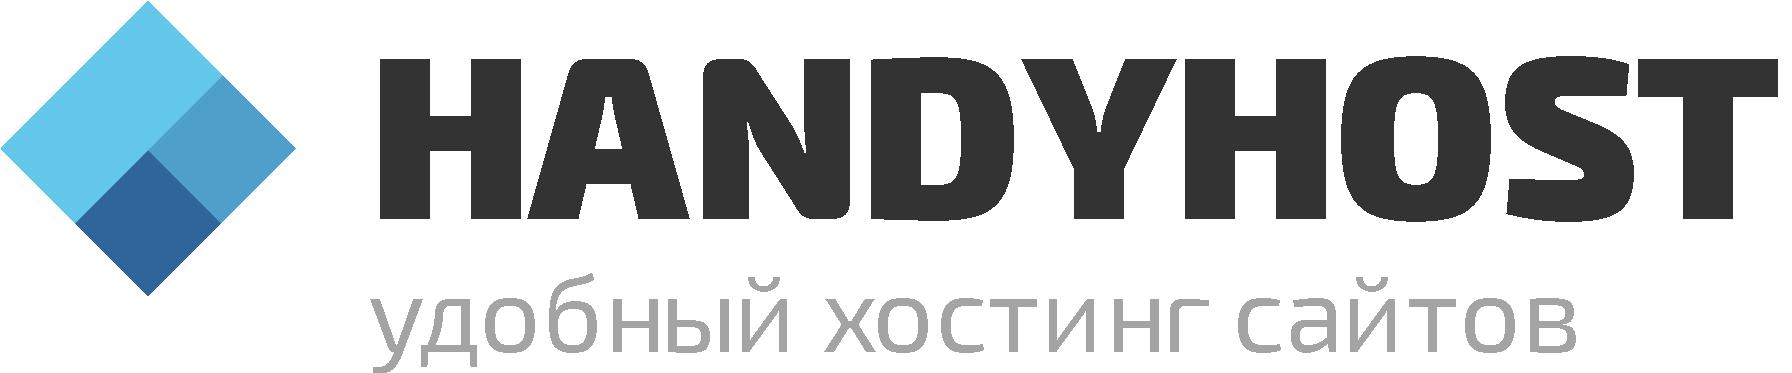 Логотип хостинговой компании Handyhost.ru